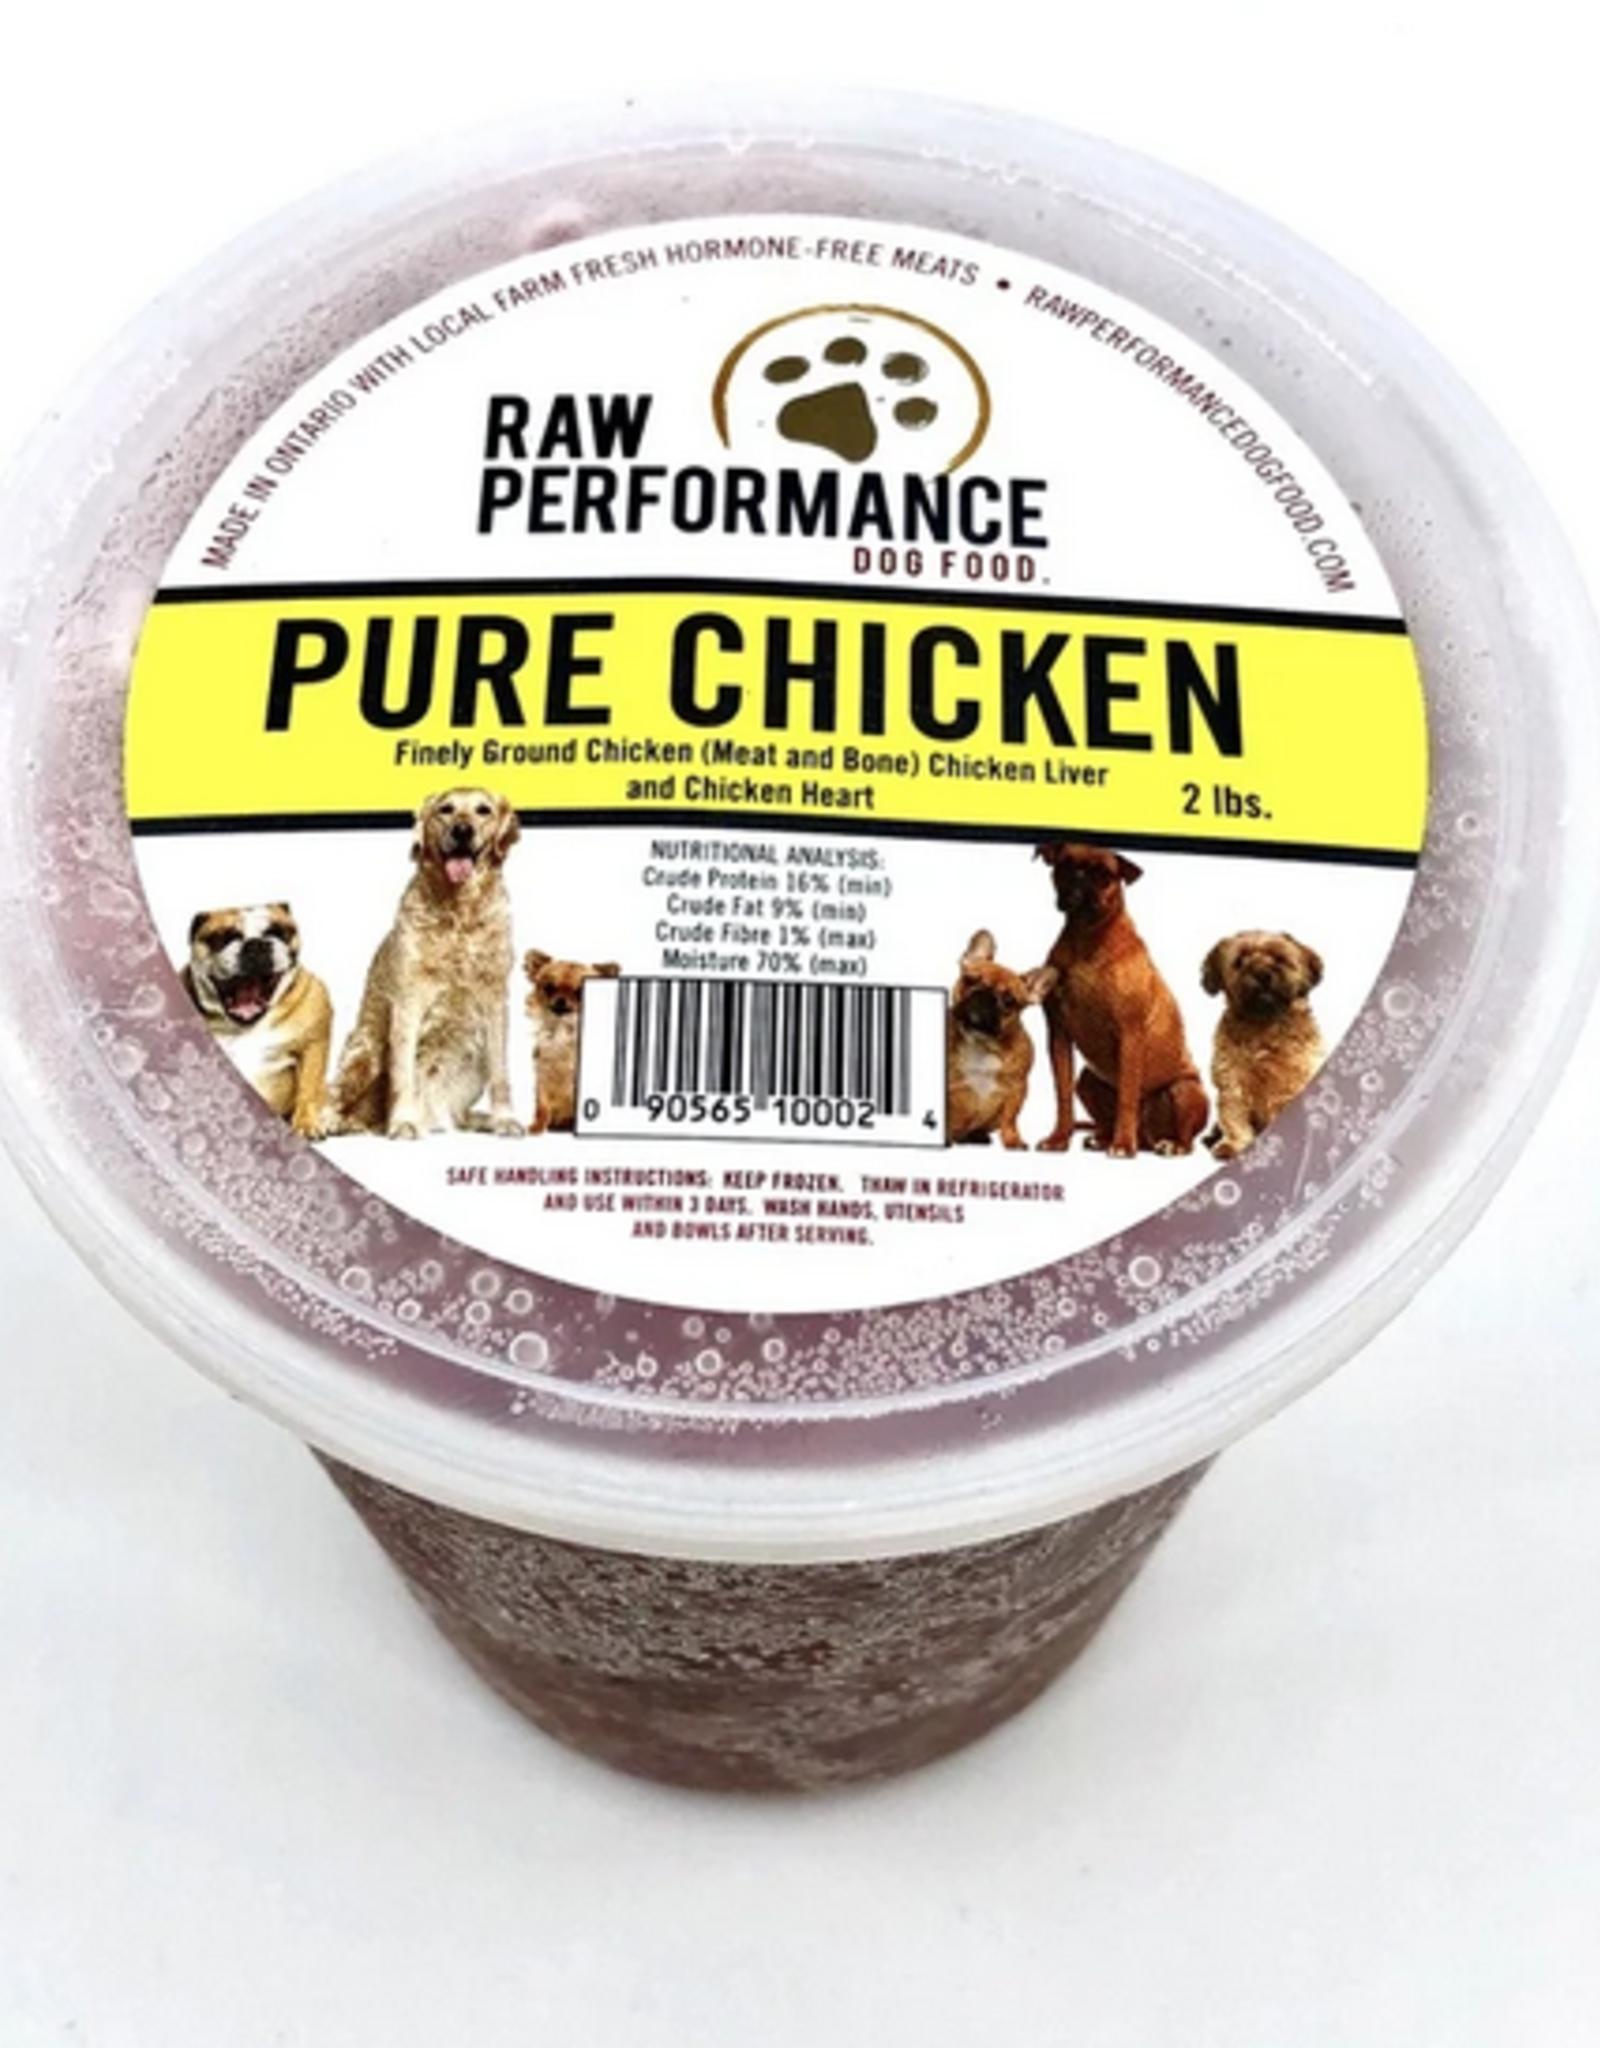 Raw Performance Raw Performance - Pure Chicken 4lb